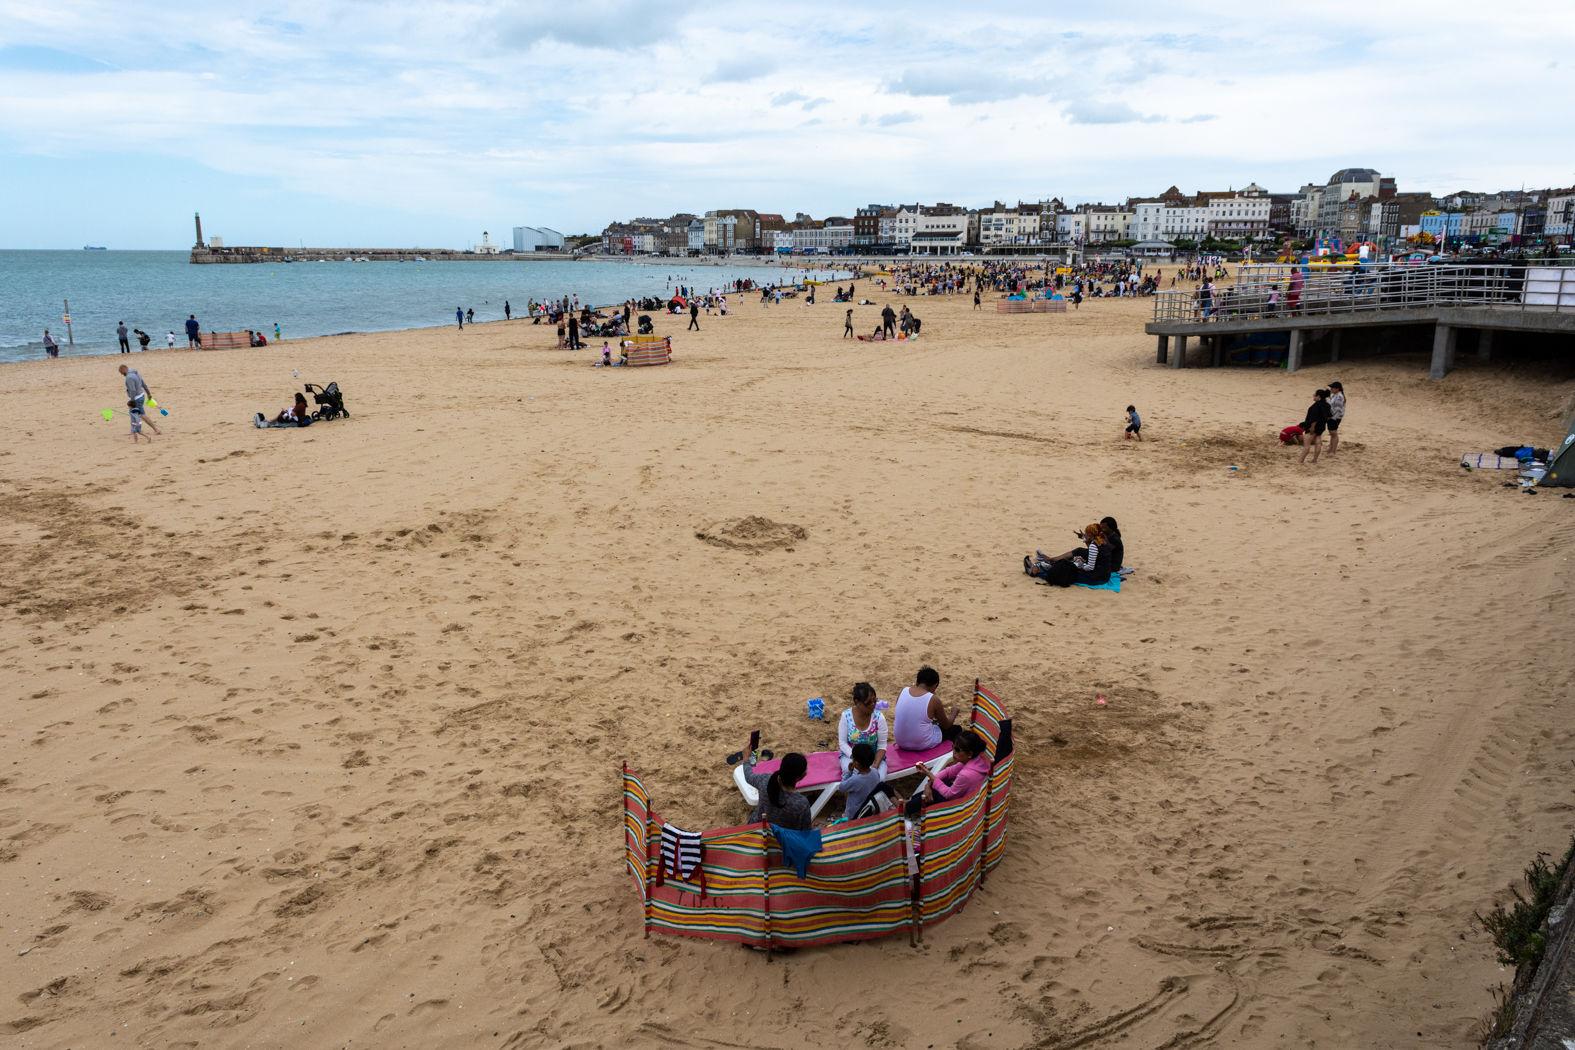 The beach at Margate